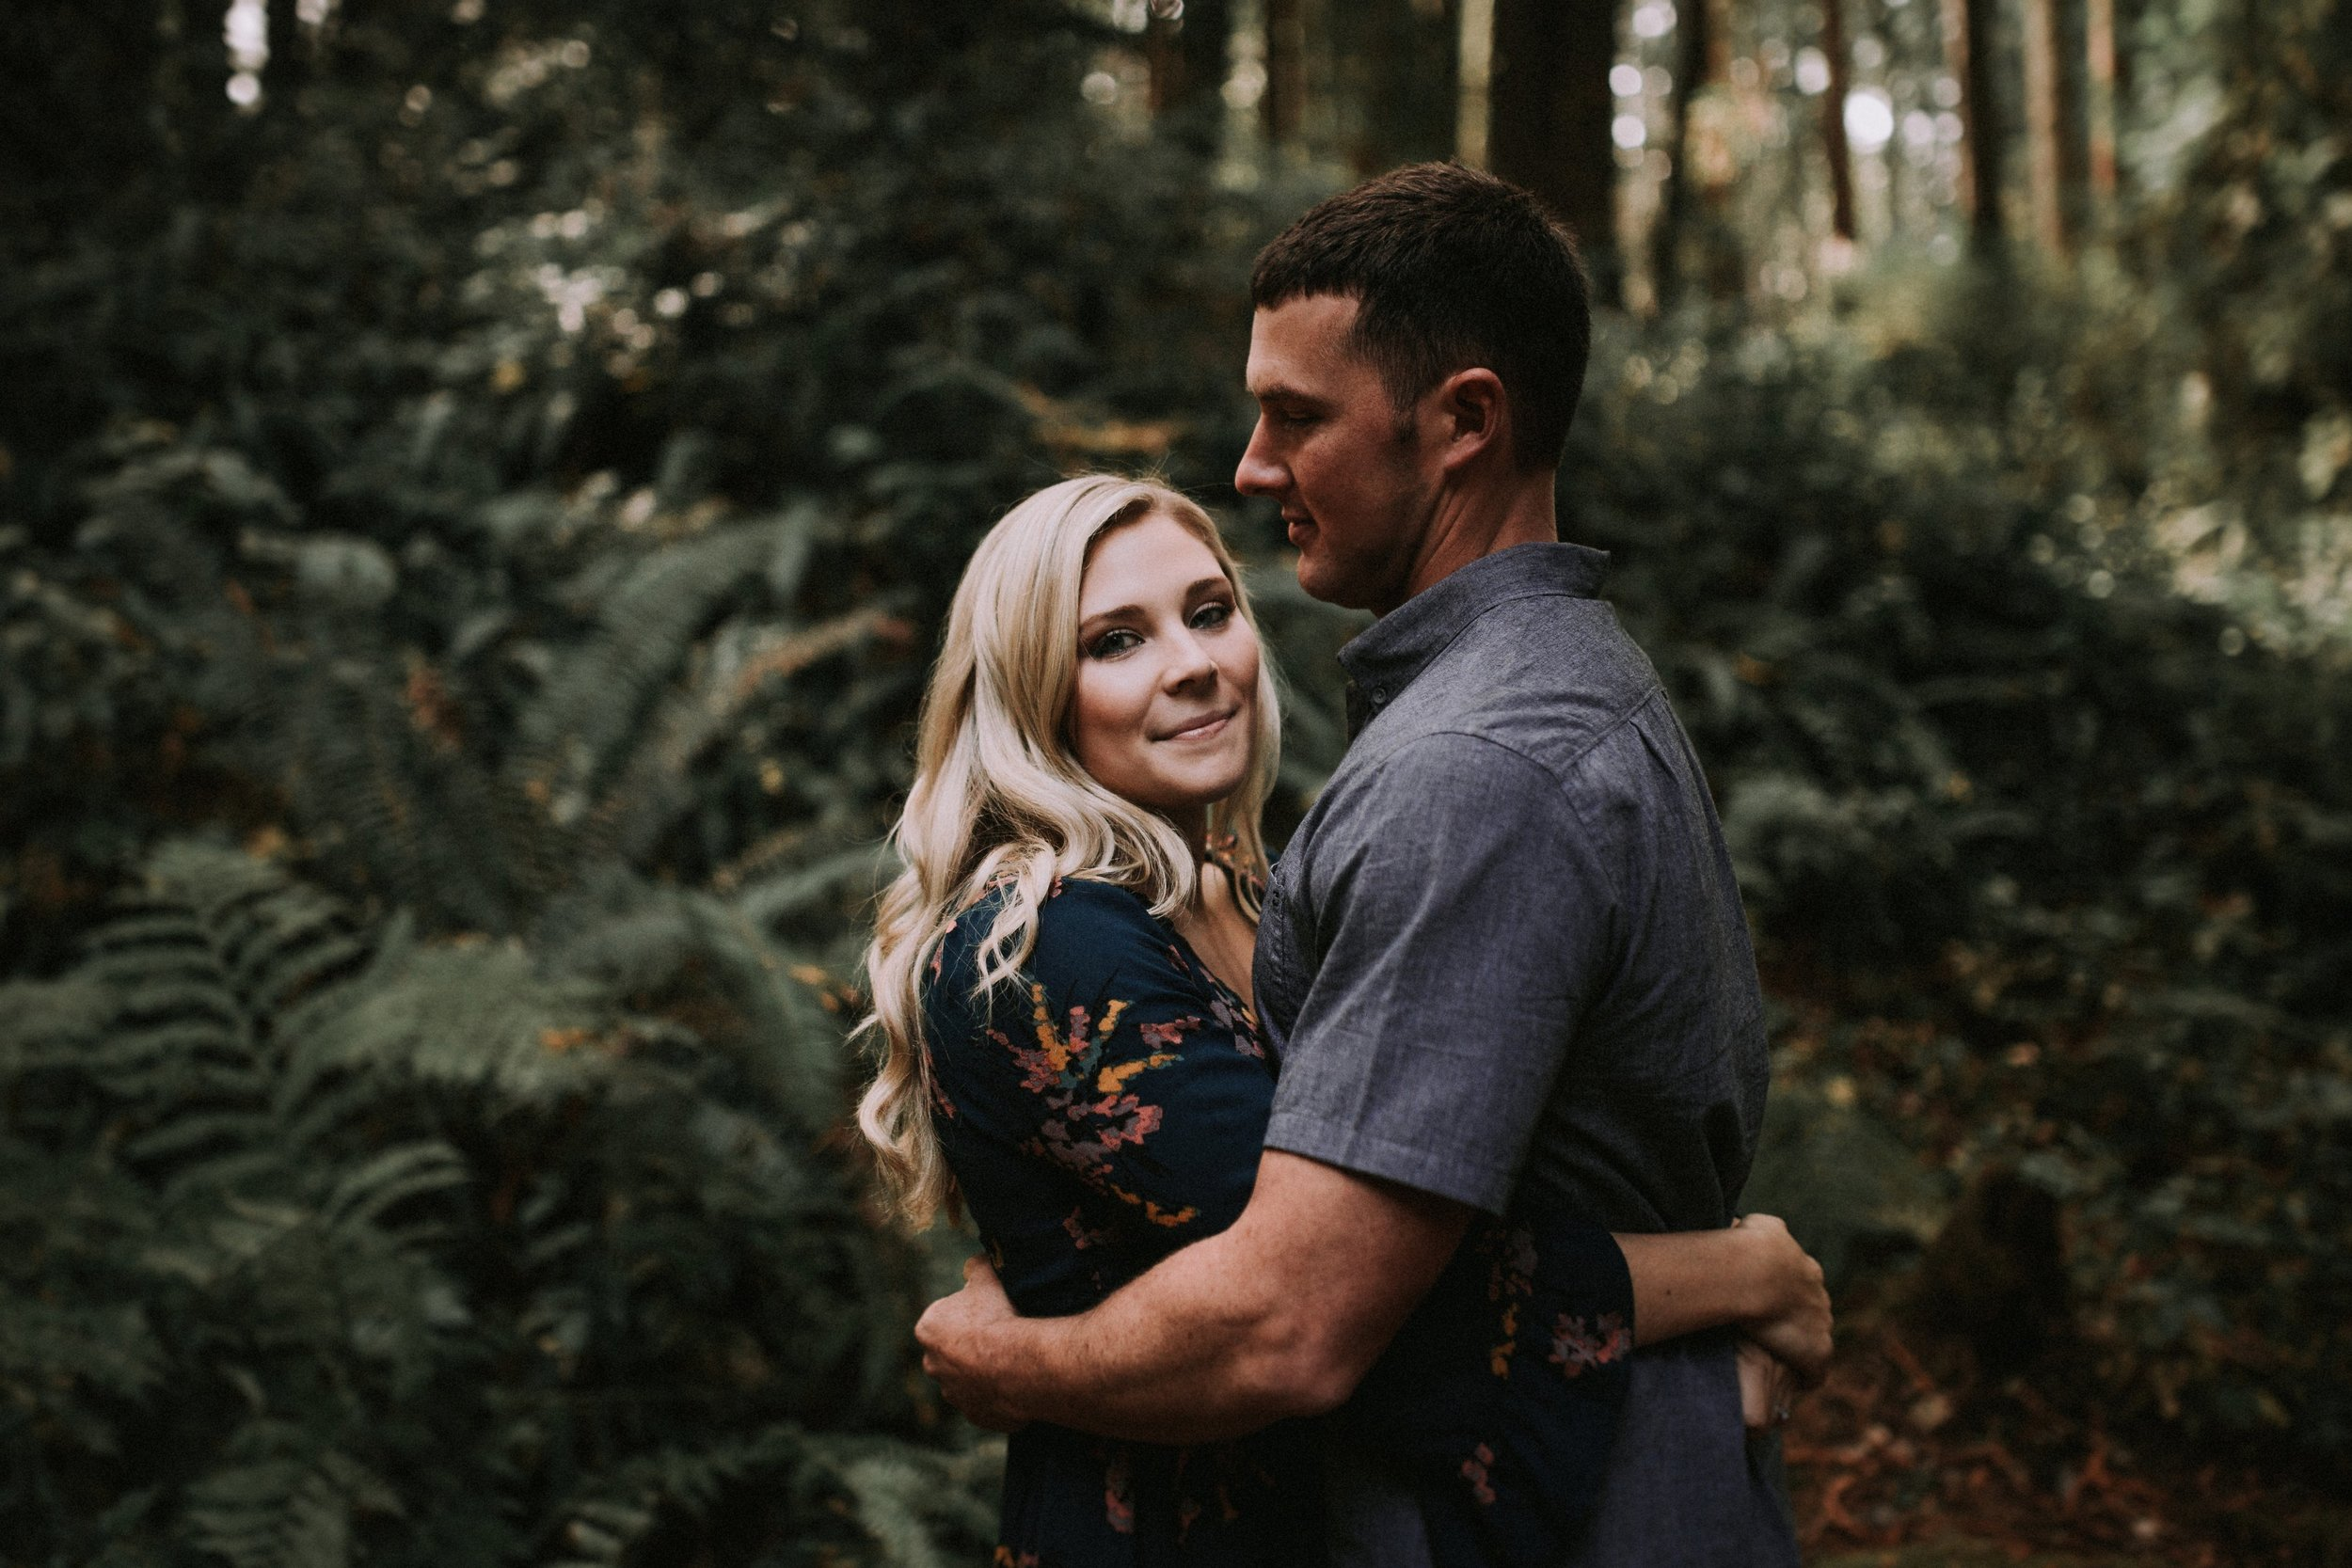 Engagements-44x.jpg